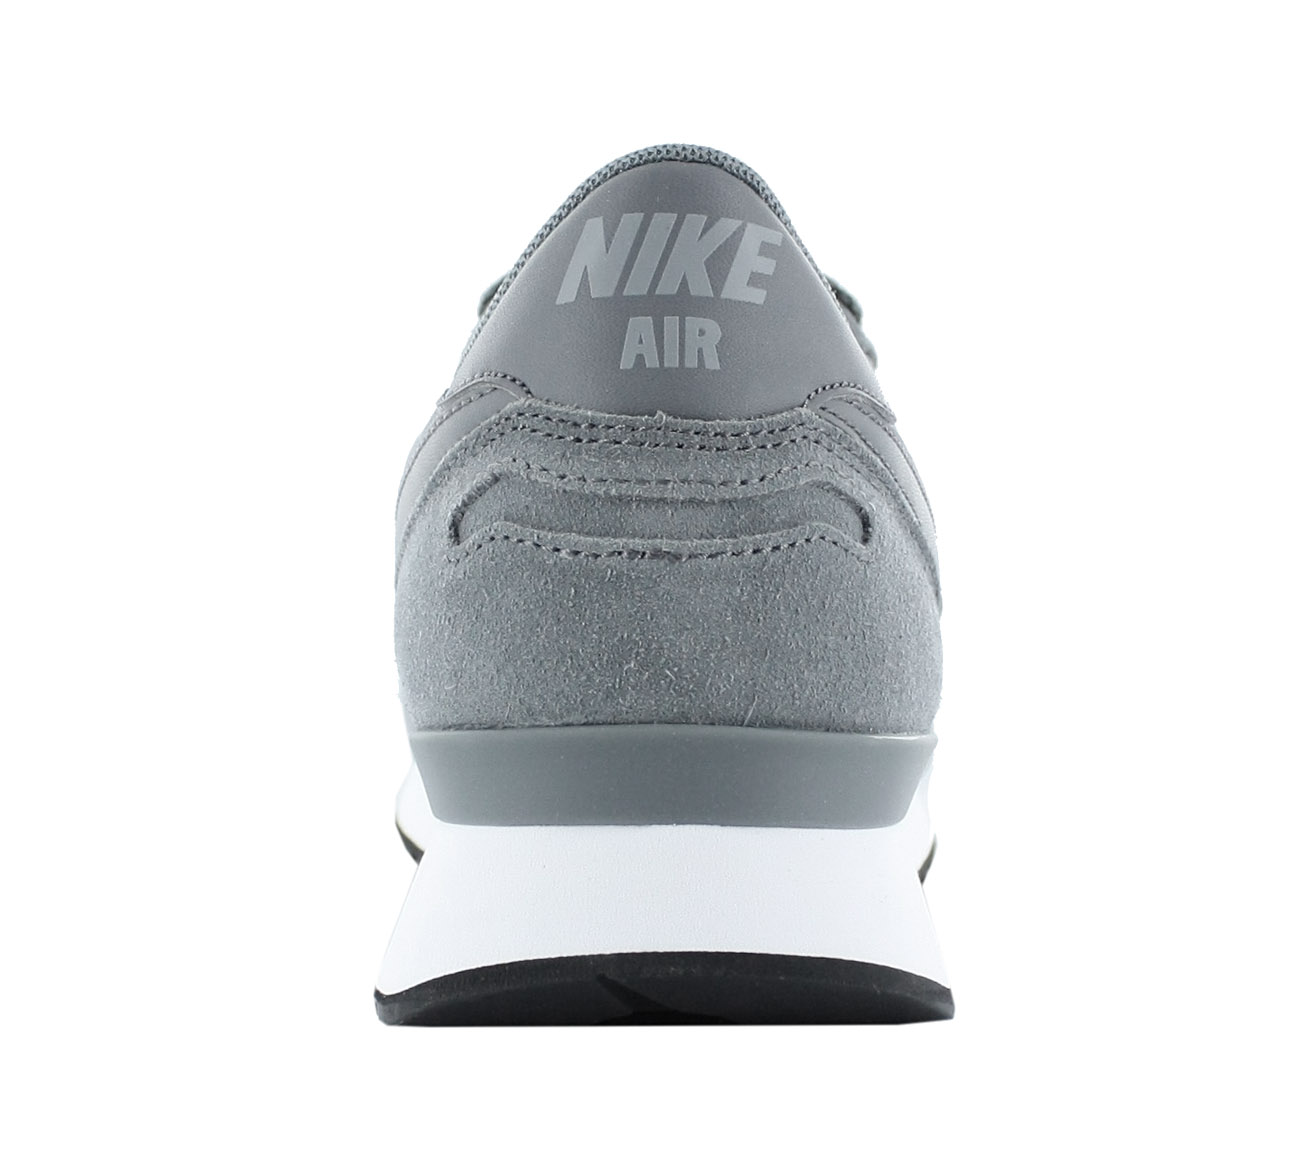 brand new a0d51 e75a6 Modell Nike Air Vortex Leather Herren Schuhe Grau